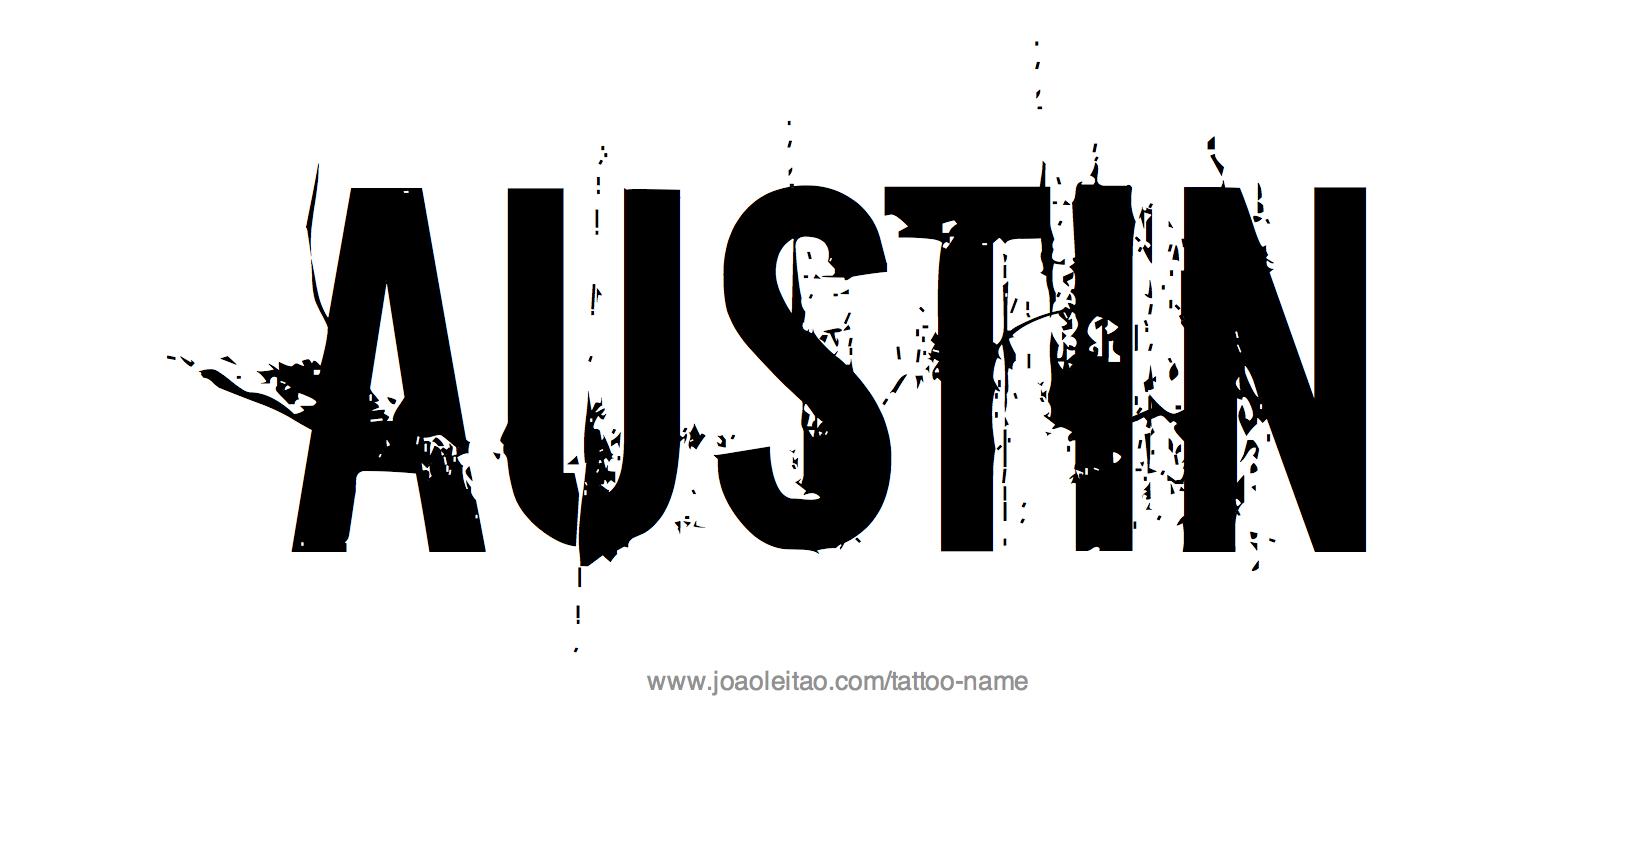 Tattoo Design Name Austin